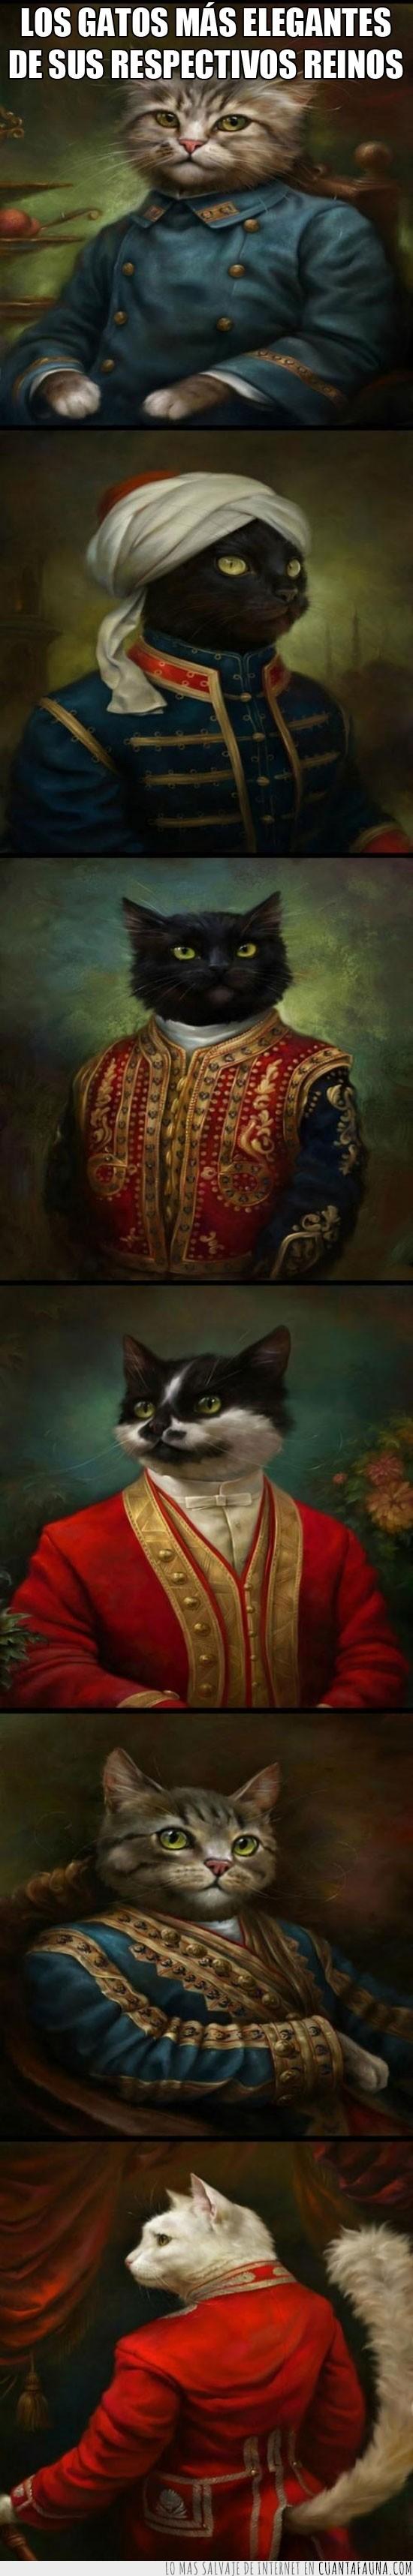 antiguas,elegantes,gato,oleo,pinturas,reinos,señor,sir